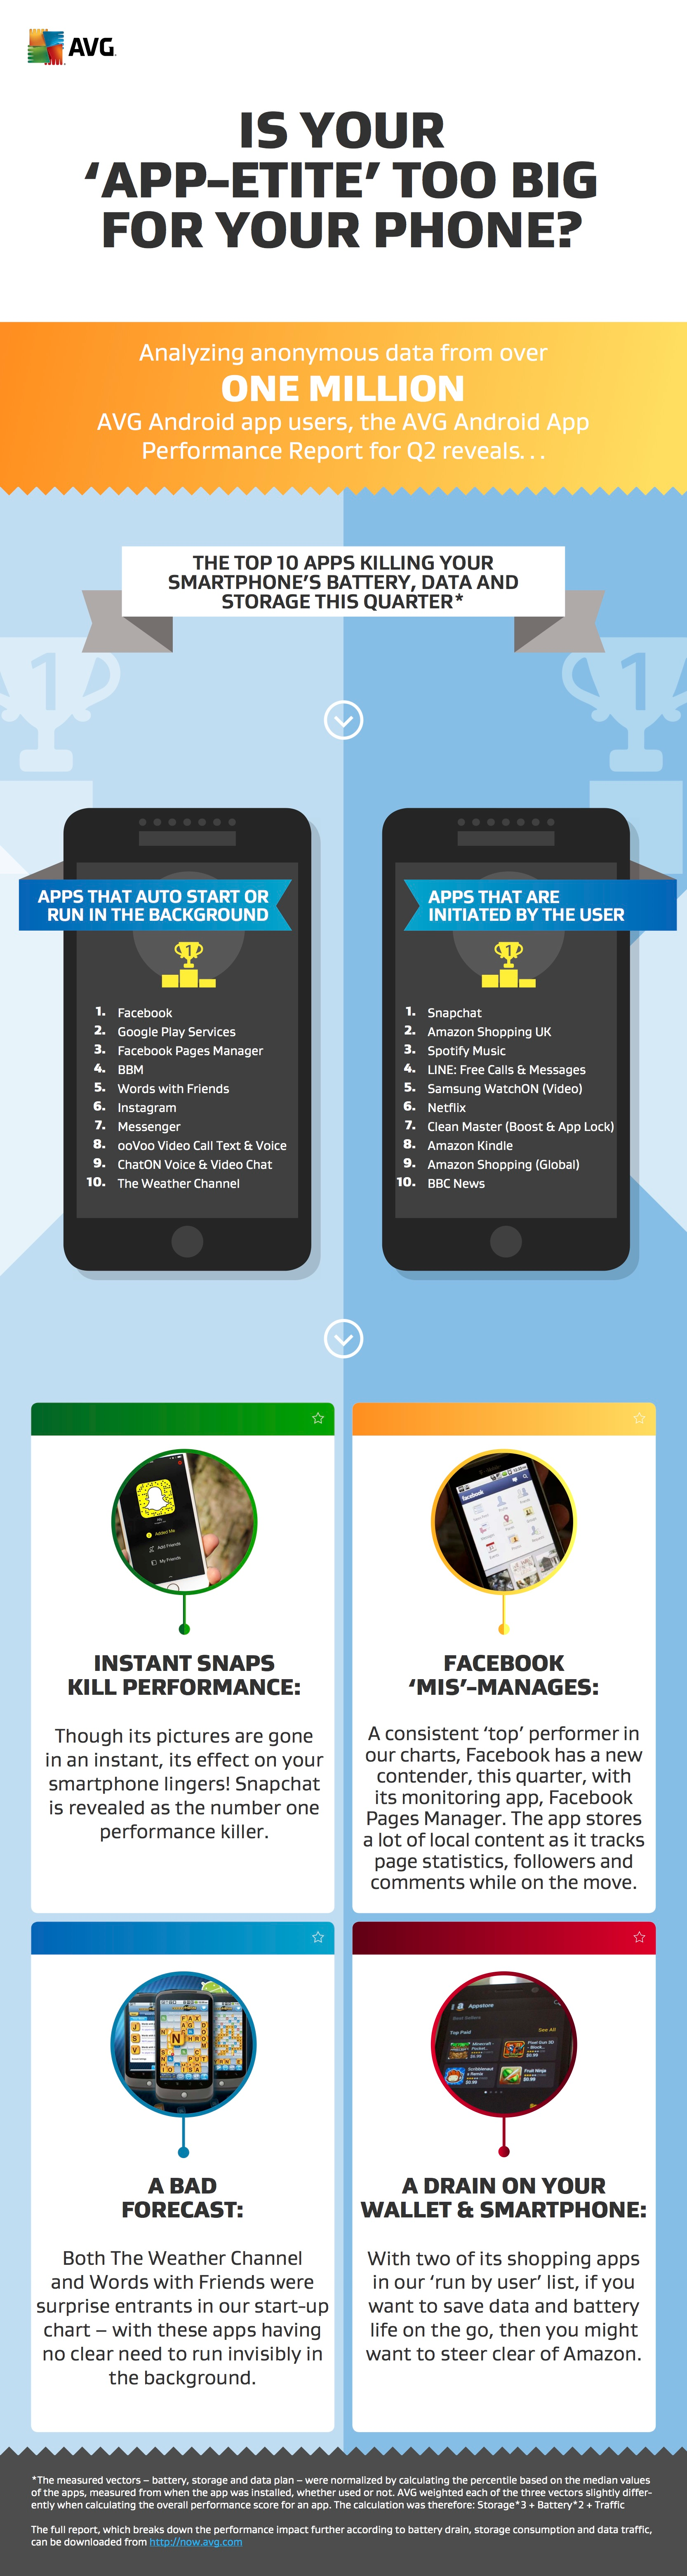 App report 2015 q2 info graphic